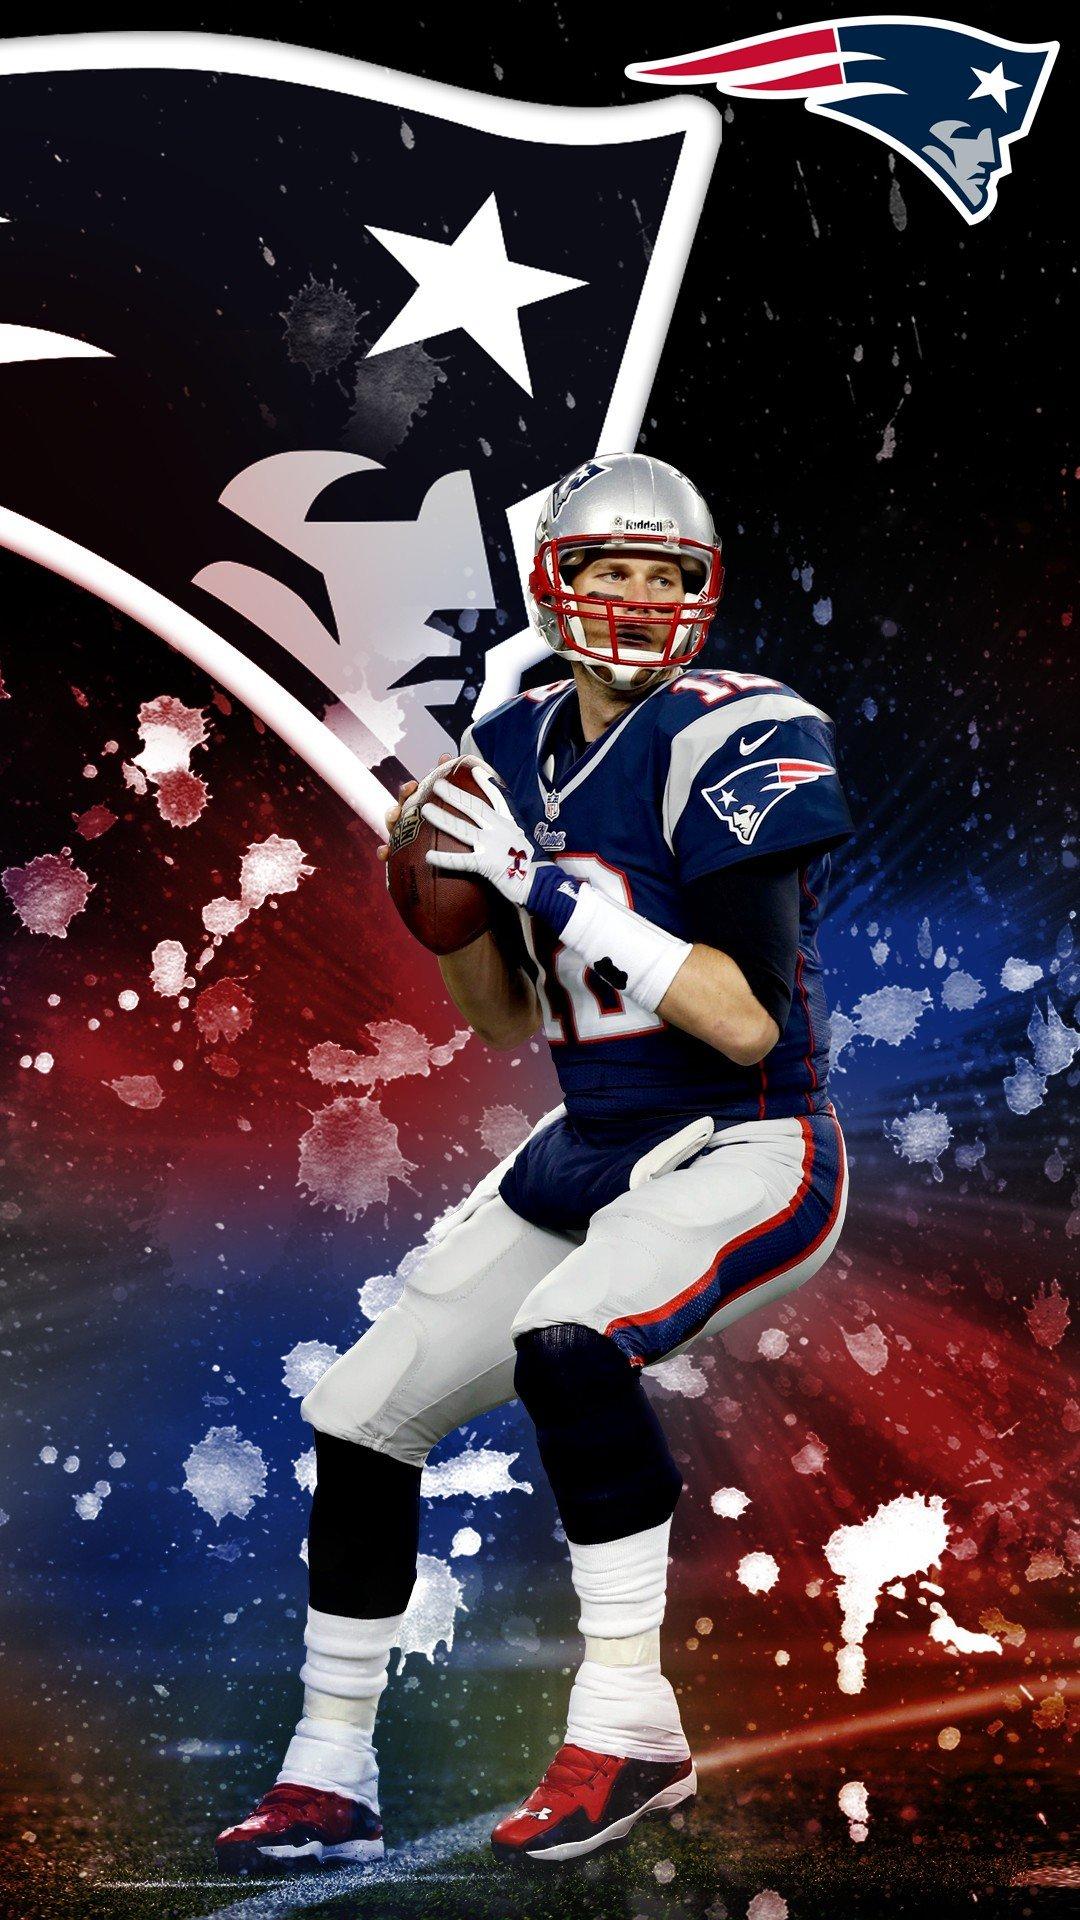 Free download Tom Brady iPhone 7 Plus Wallpaper 2020 NFL ...